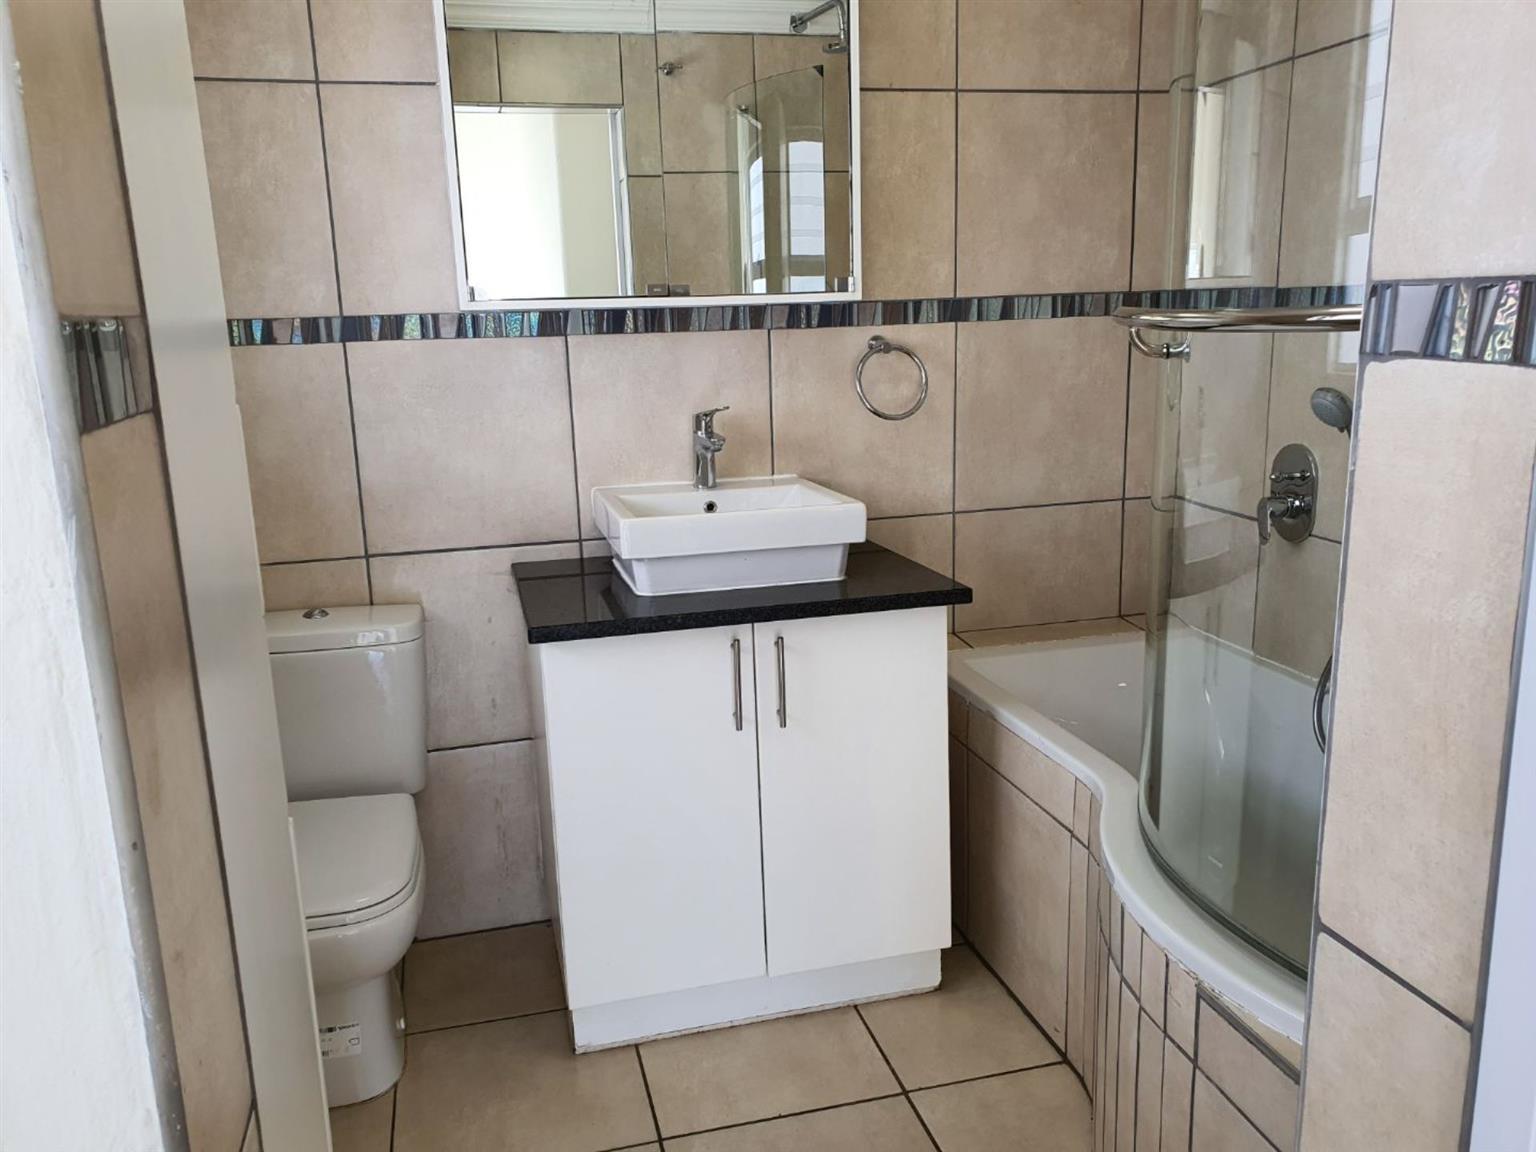 Apartment Rental Monthly in FAIRMOUNT